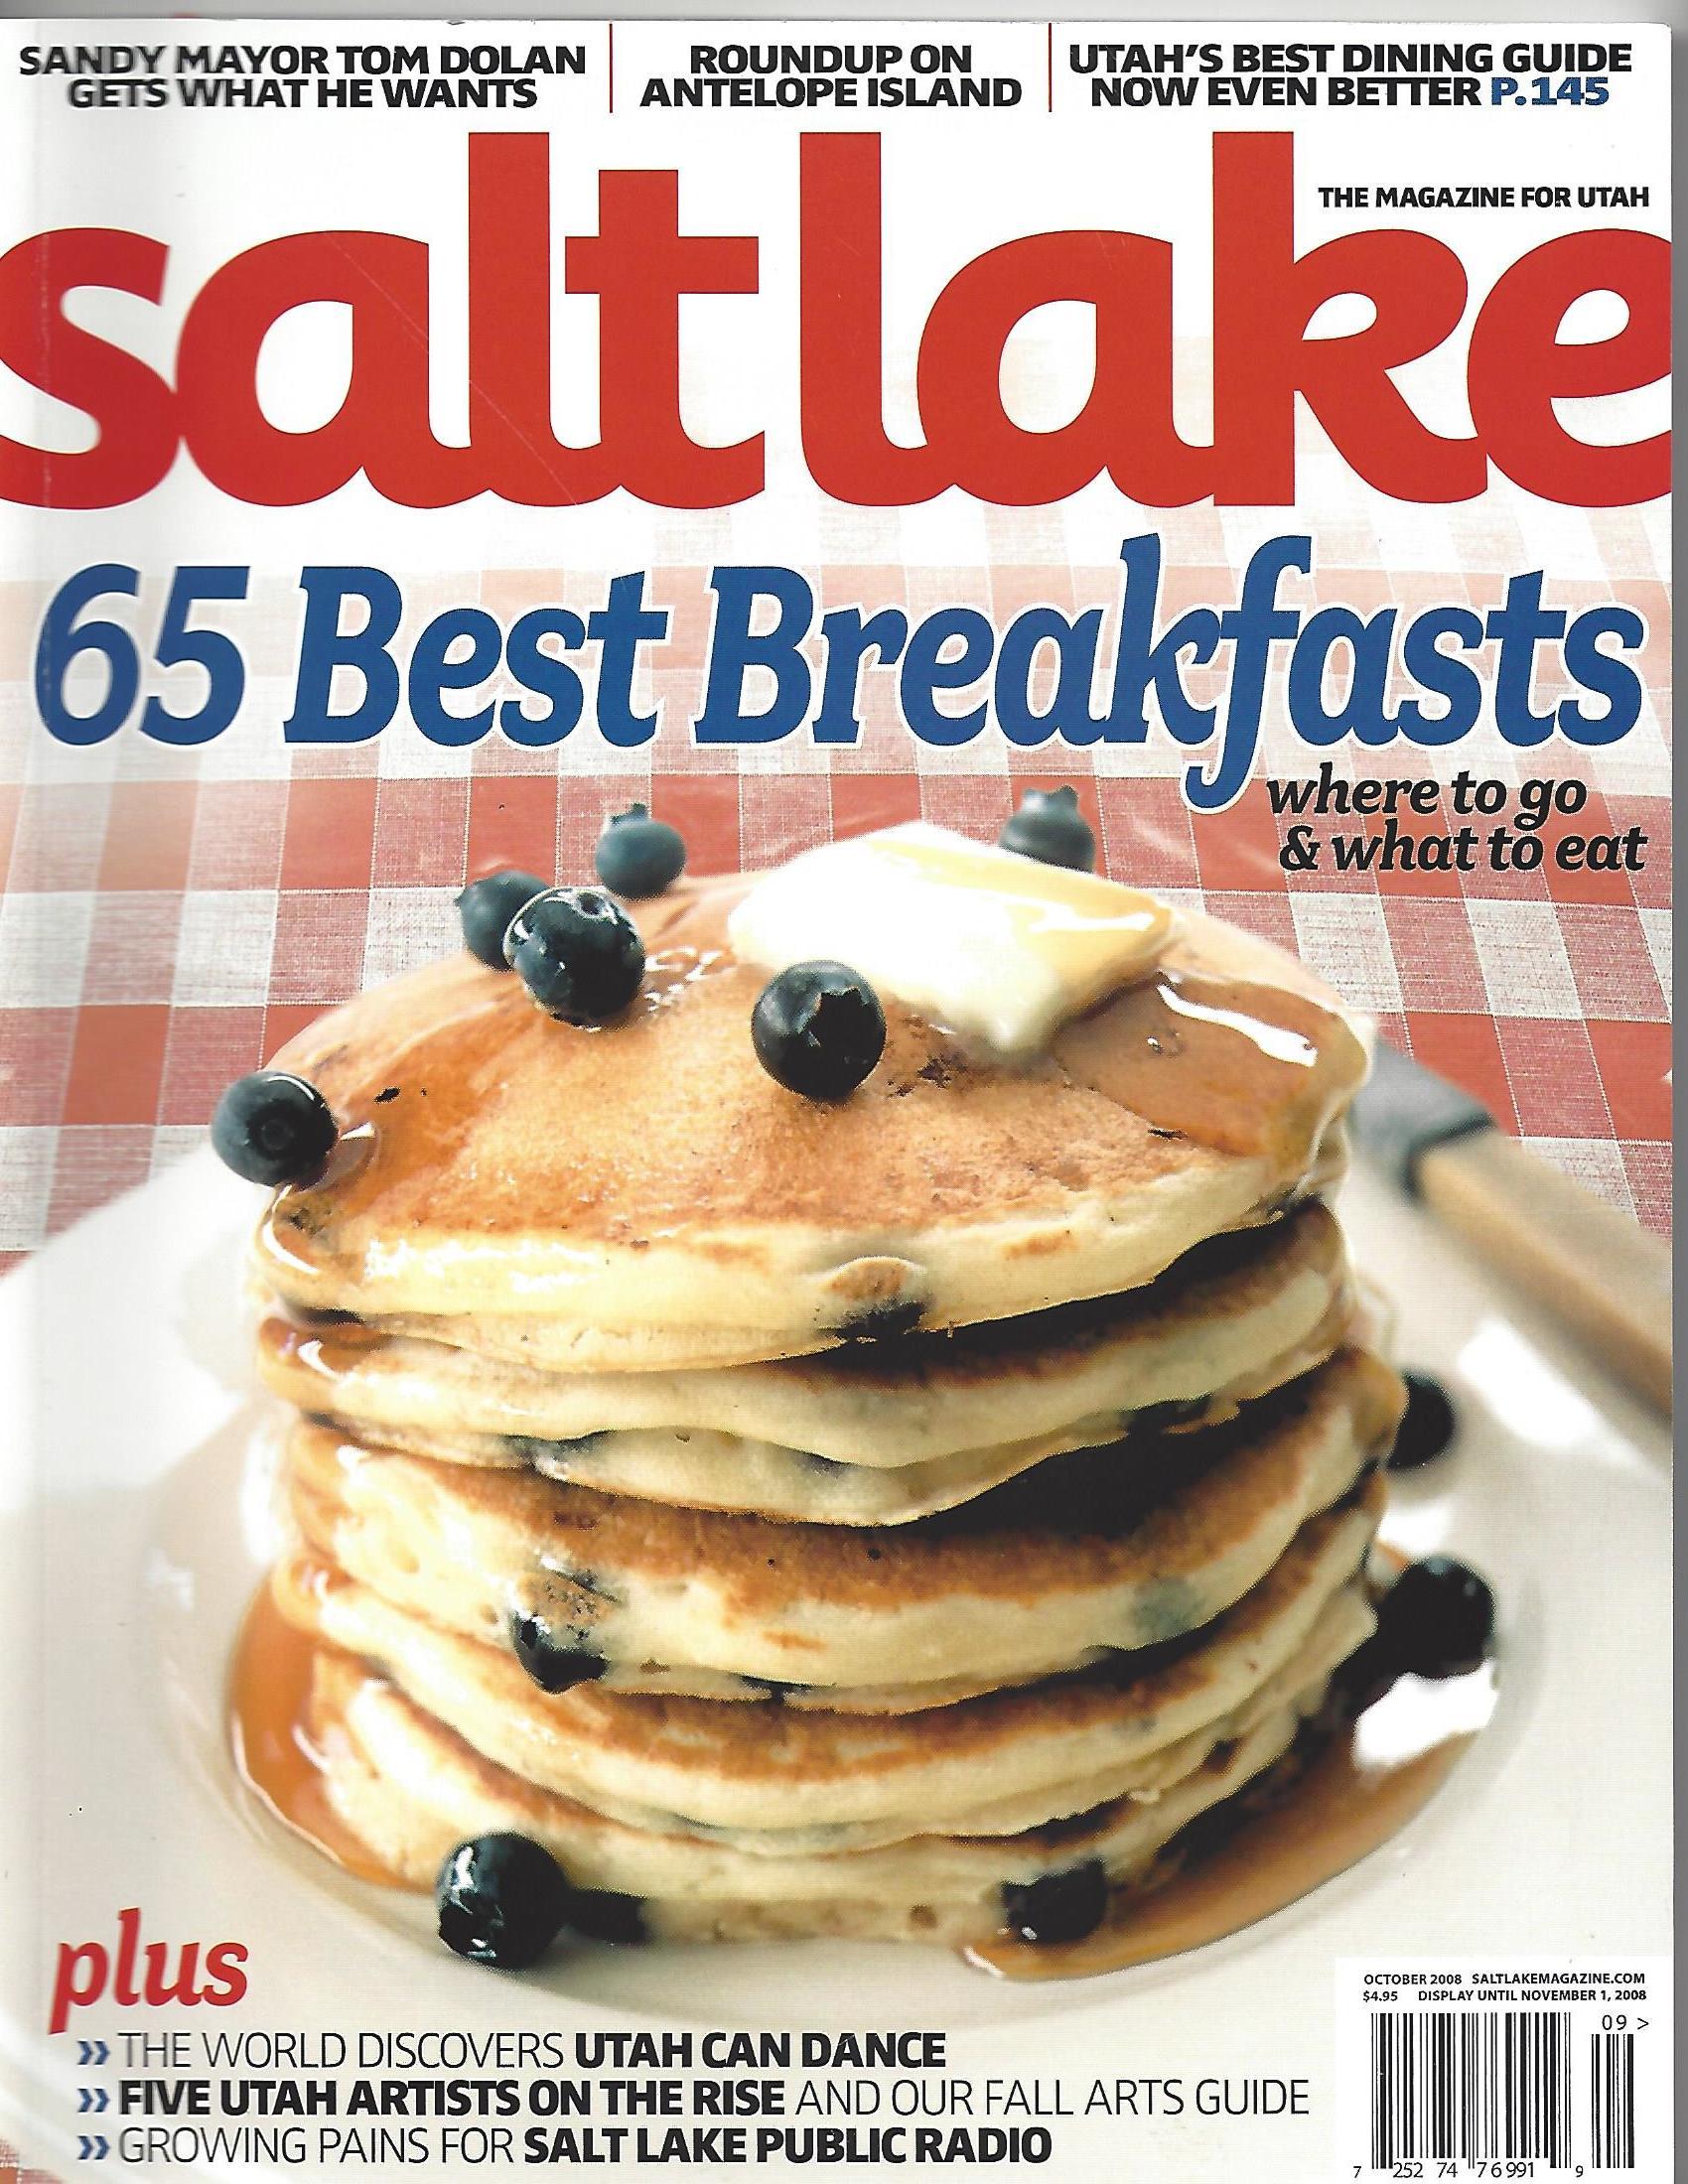 Women in Business - Salt Lake Magazine (Oct. 2008).jpg